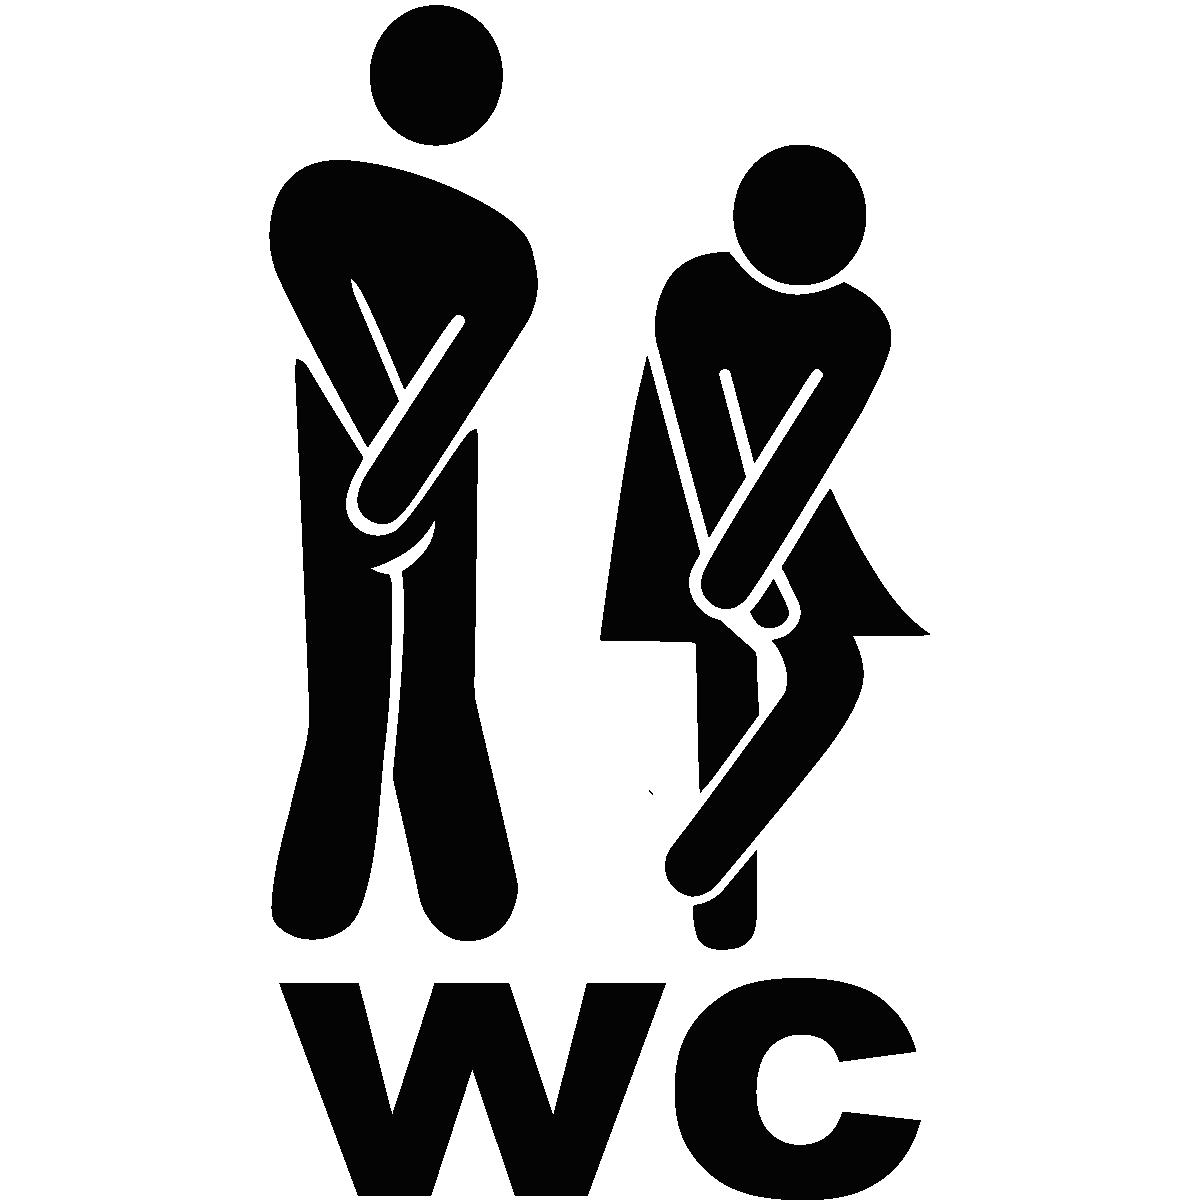 Sticker Porte Figure Wc 1 Murale Ambiance Et Portes